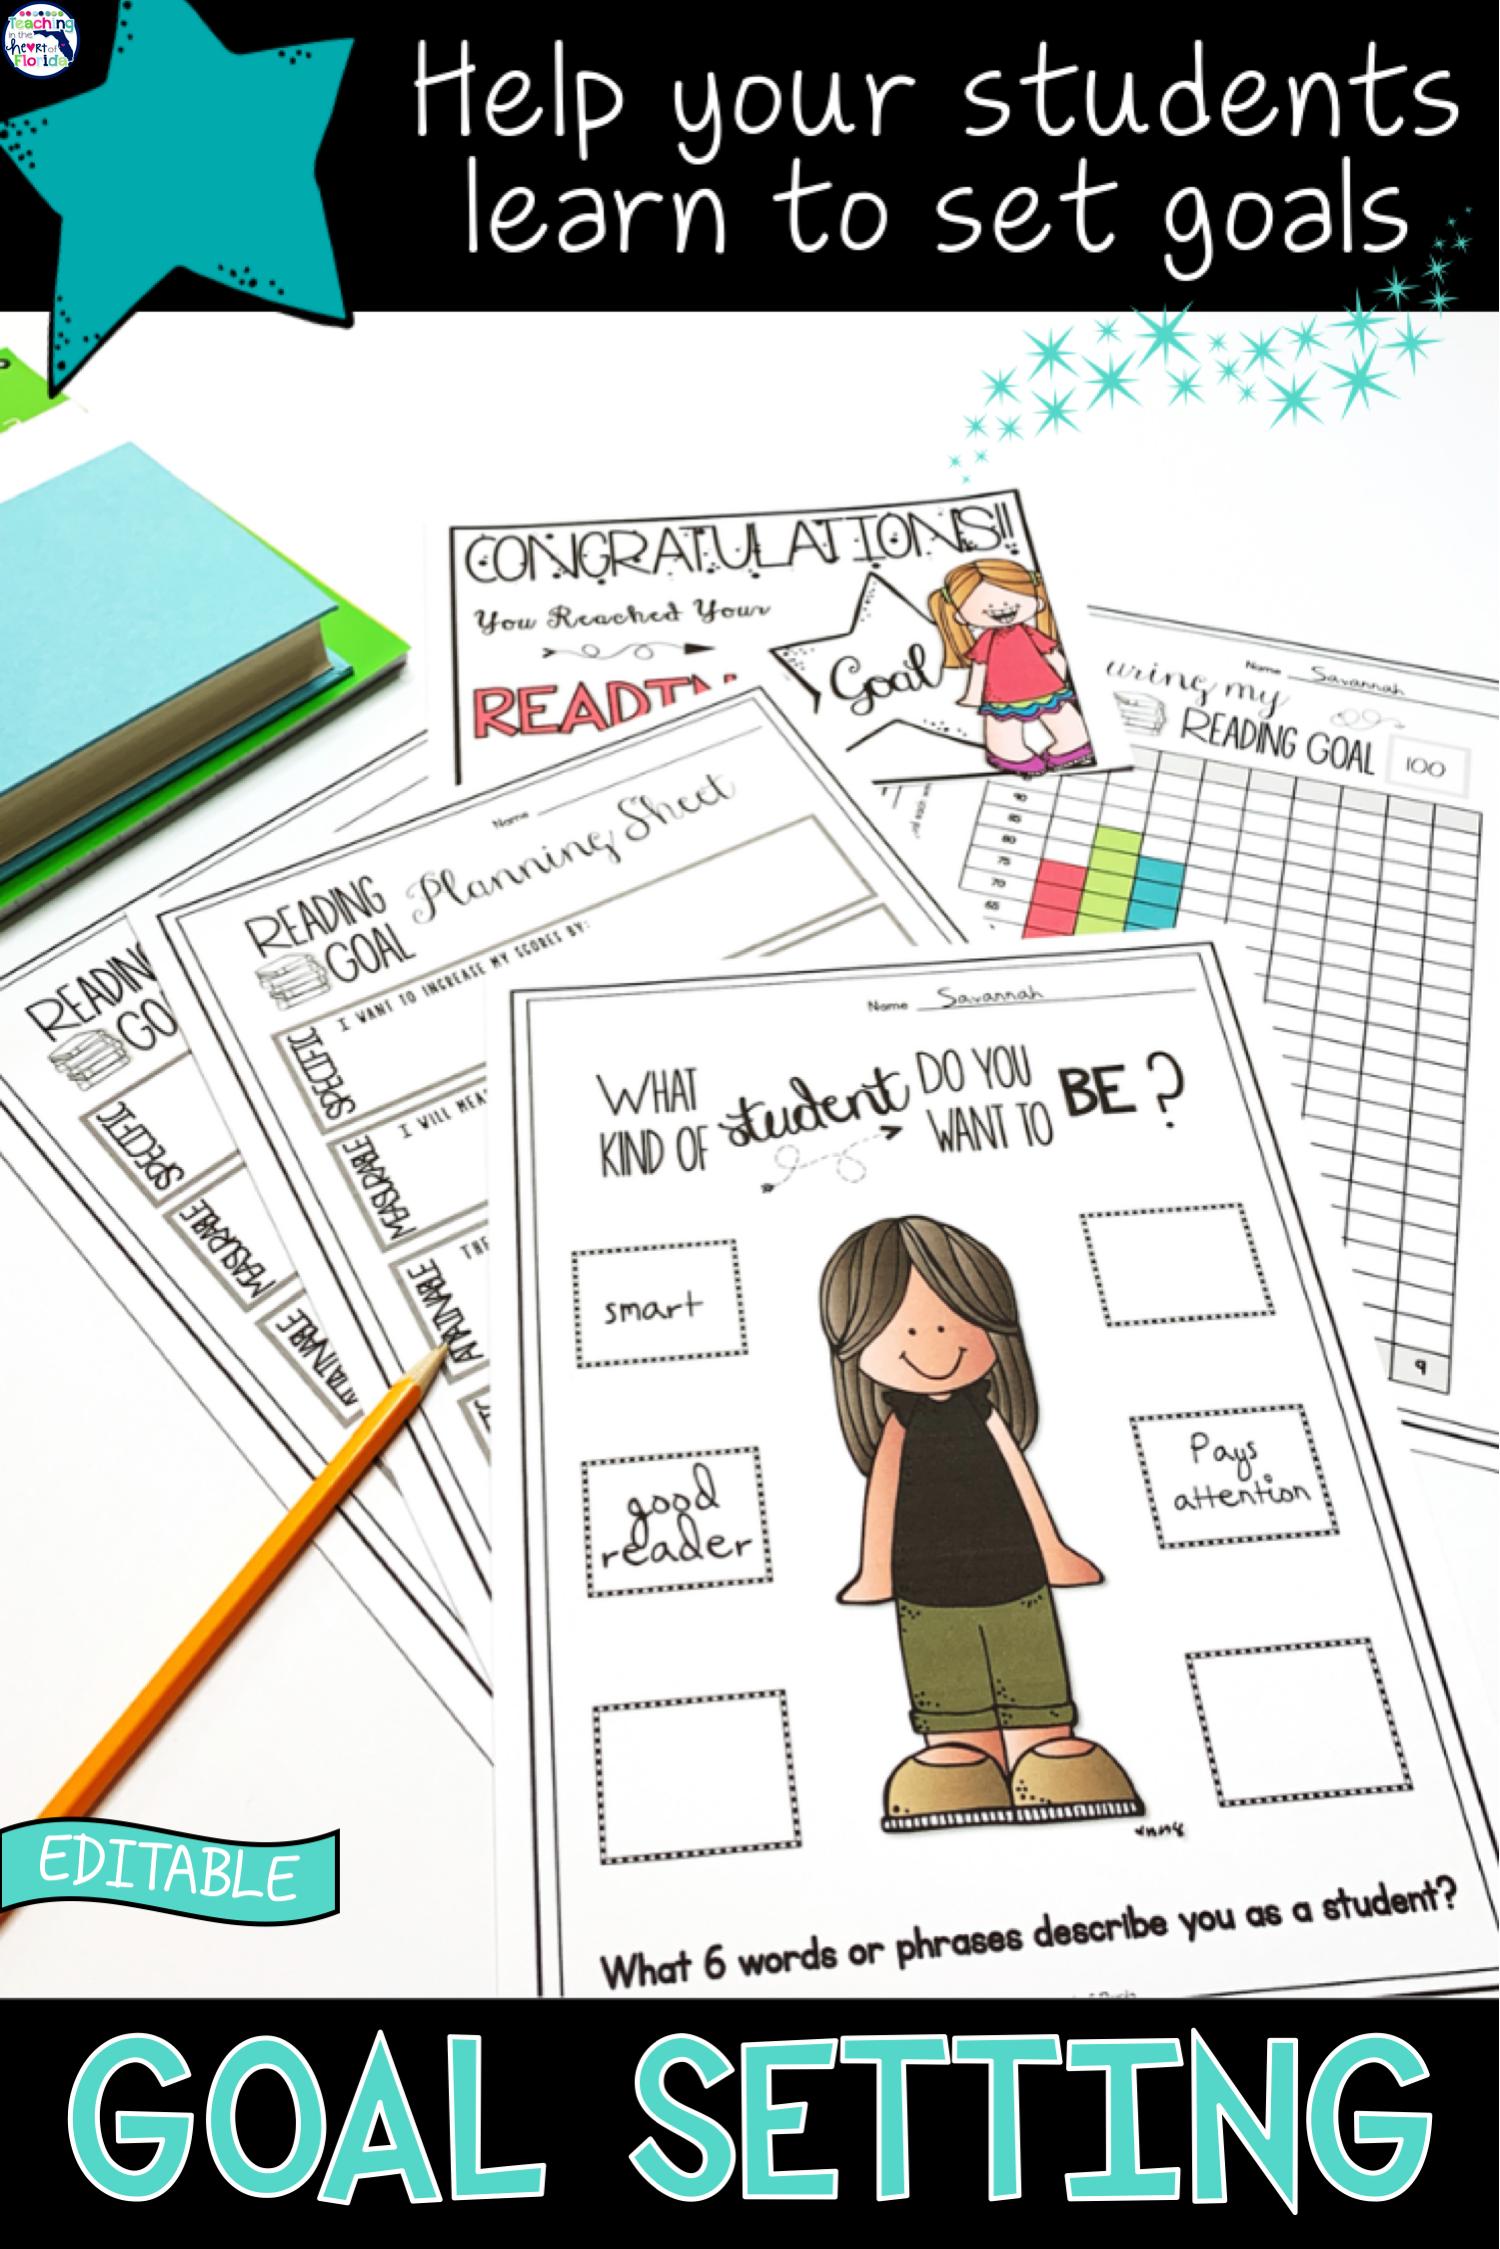 Goal Setting Worksheets And Data Tracking Social Emotional Learning Smart Goals Worksheet Goals Worksheet [ 2249 x 1500 Pixel ]